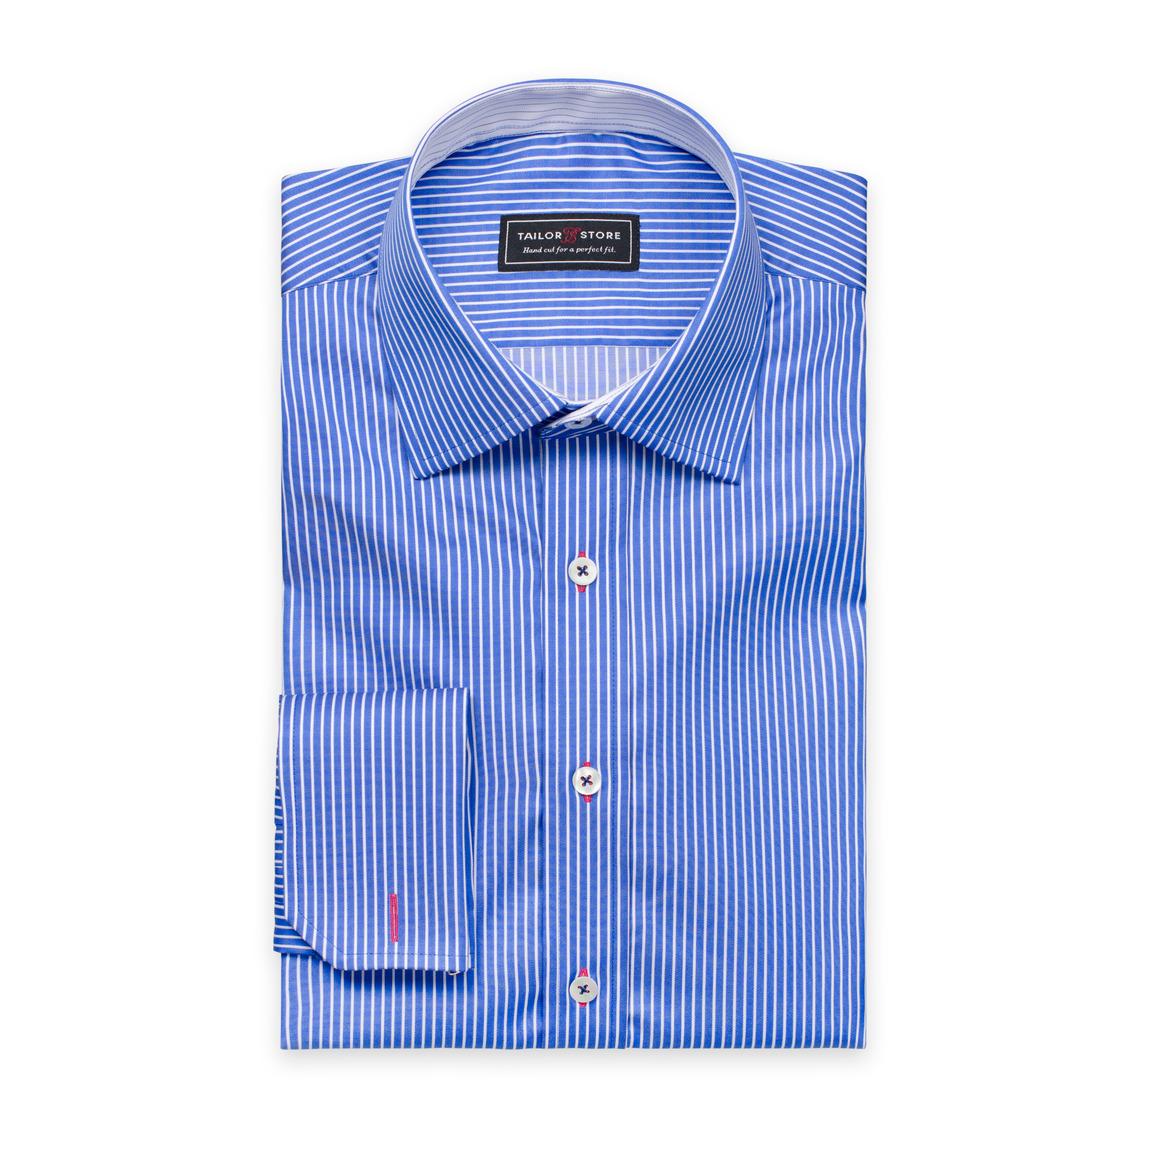 Chemise à rayures Blanc/Bleu foncé